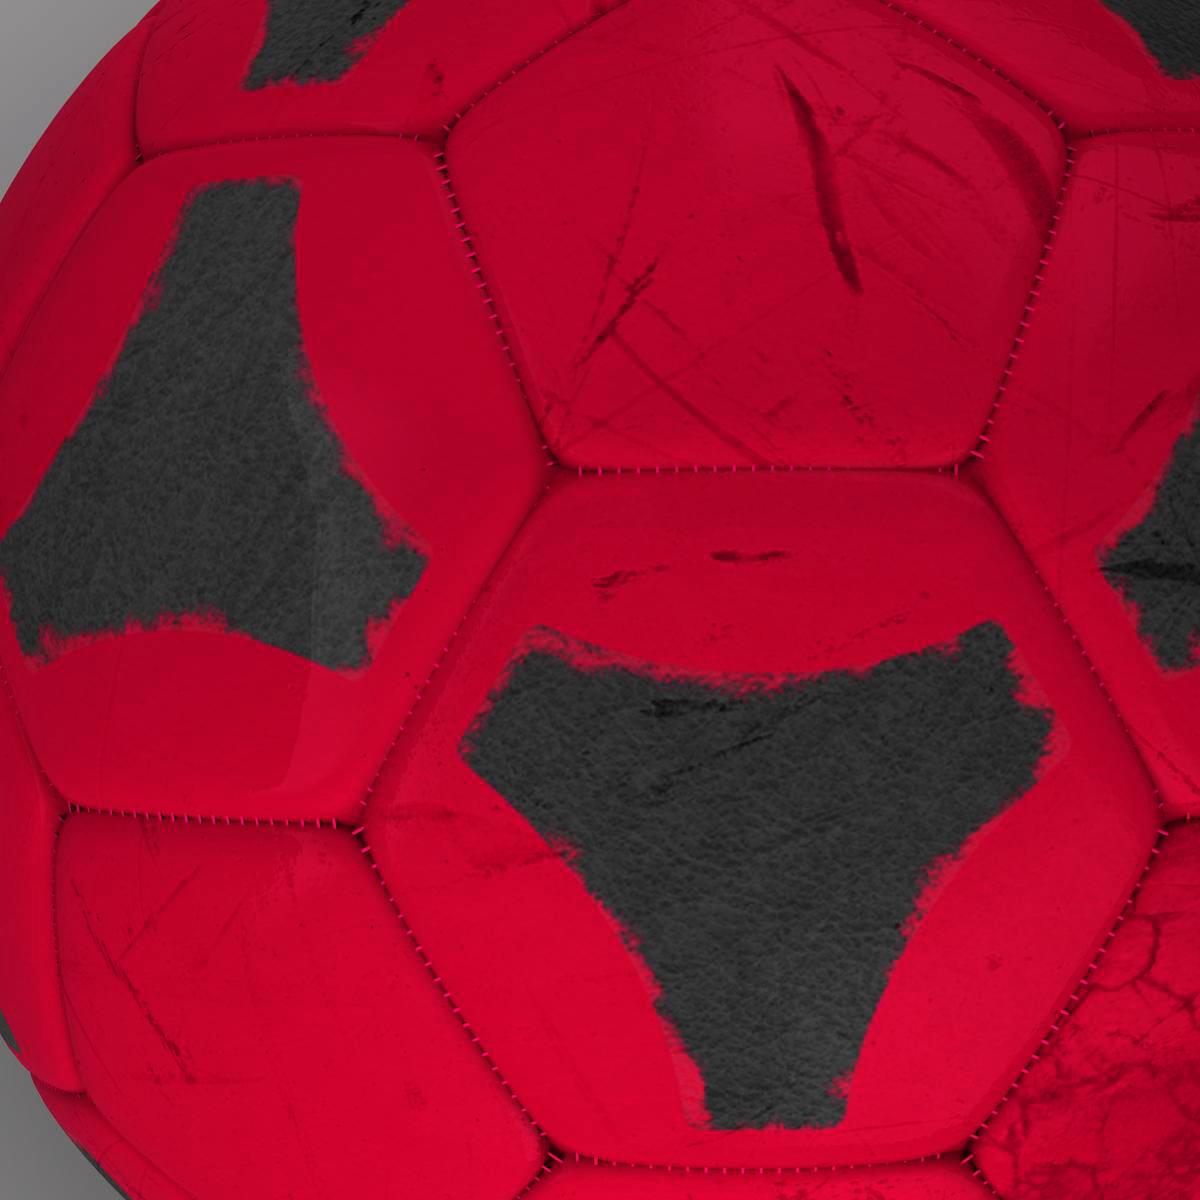 soccerball red black 3d model 3ds max fbx c4d ma mb obj 204551